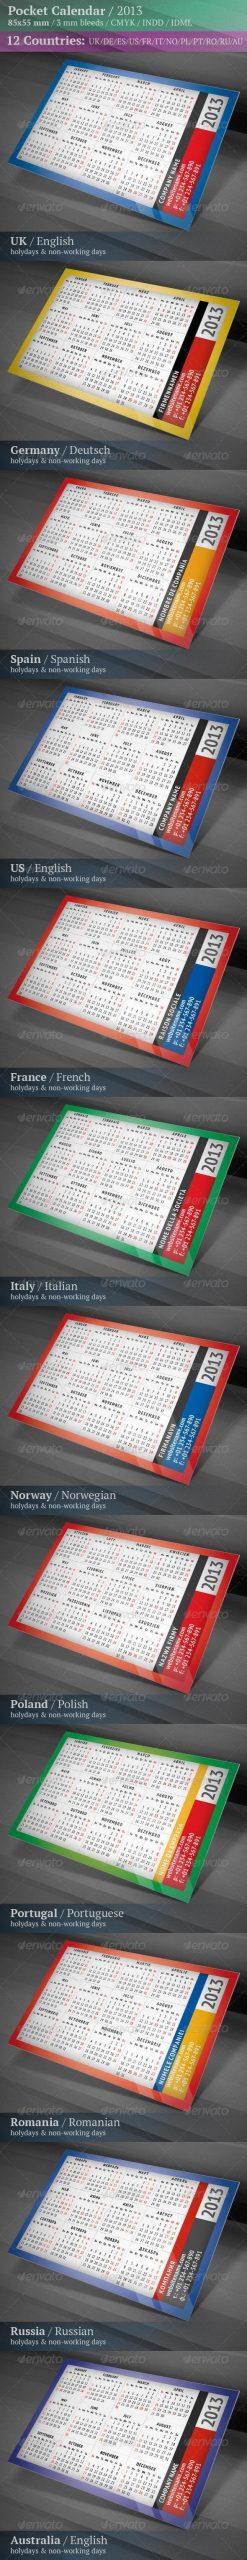 Printable 2013 Calendar Templates | Psddude